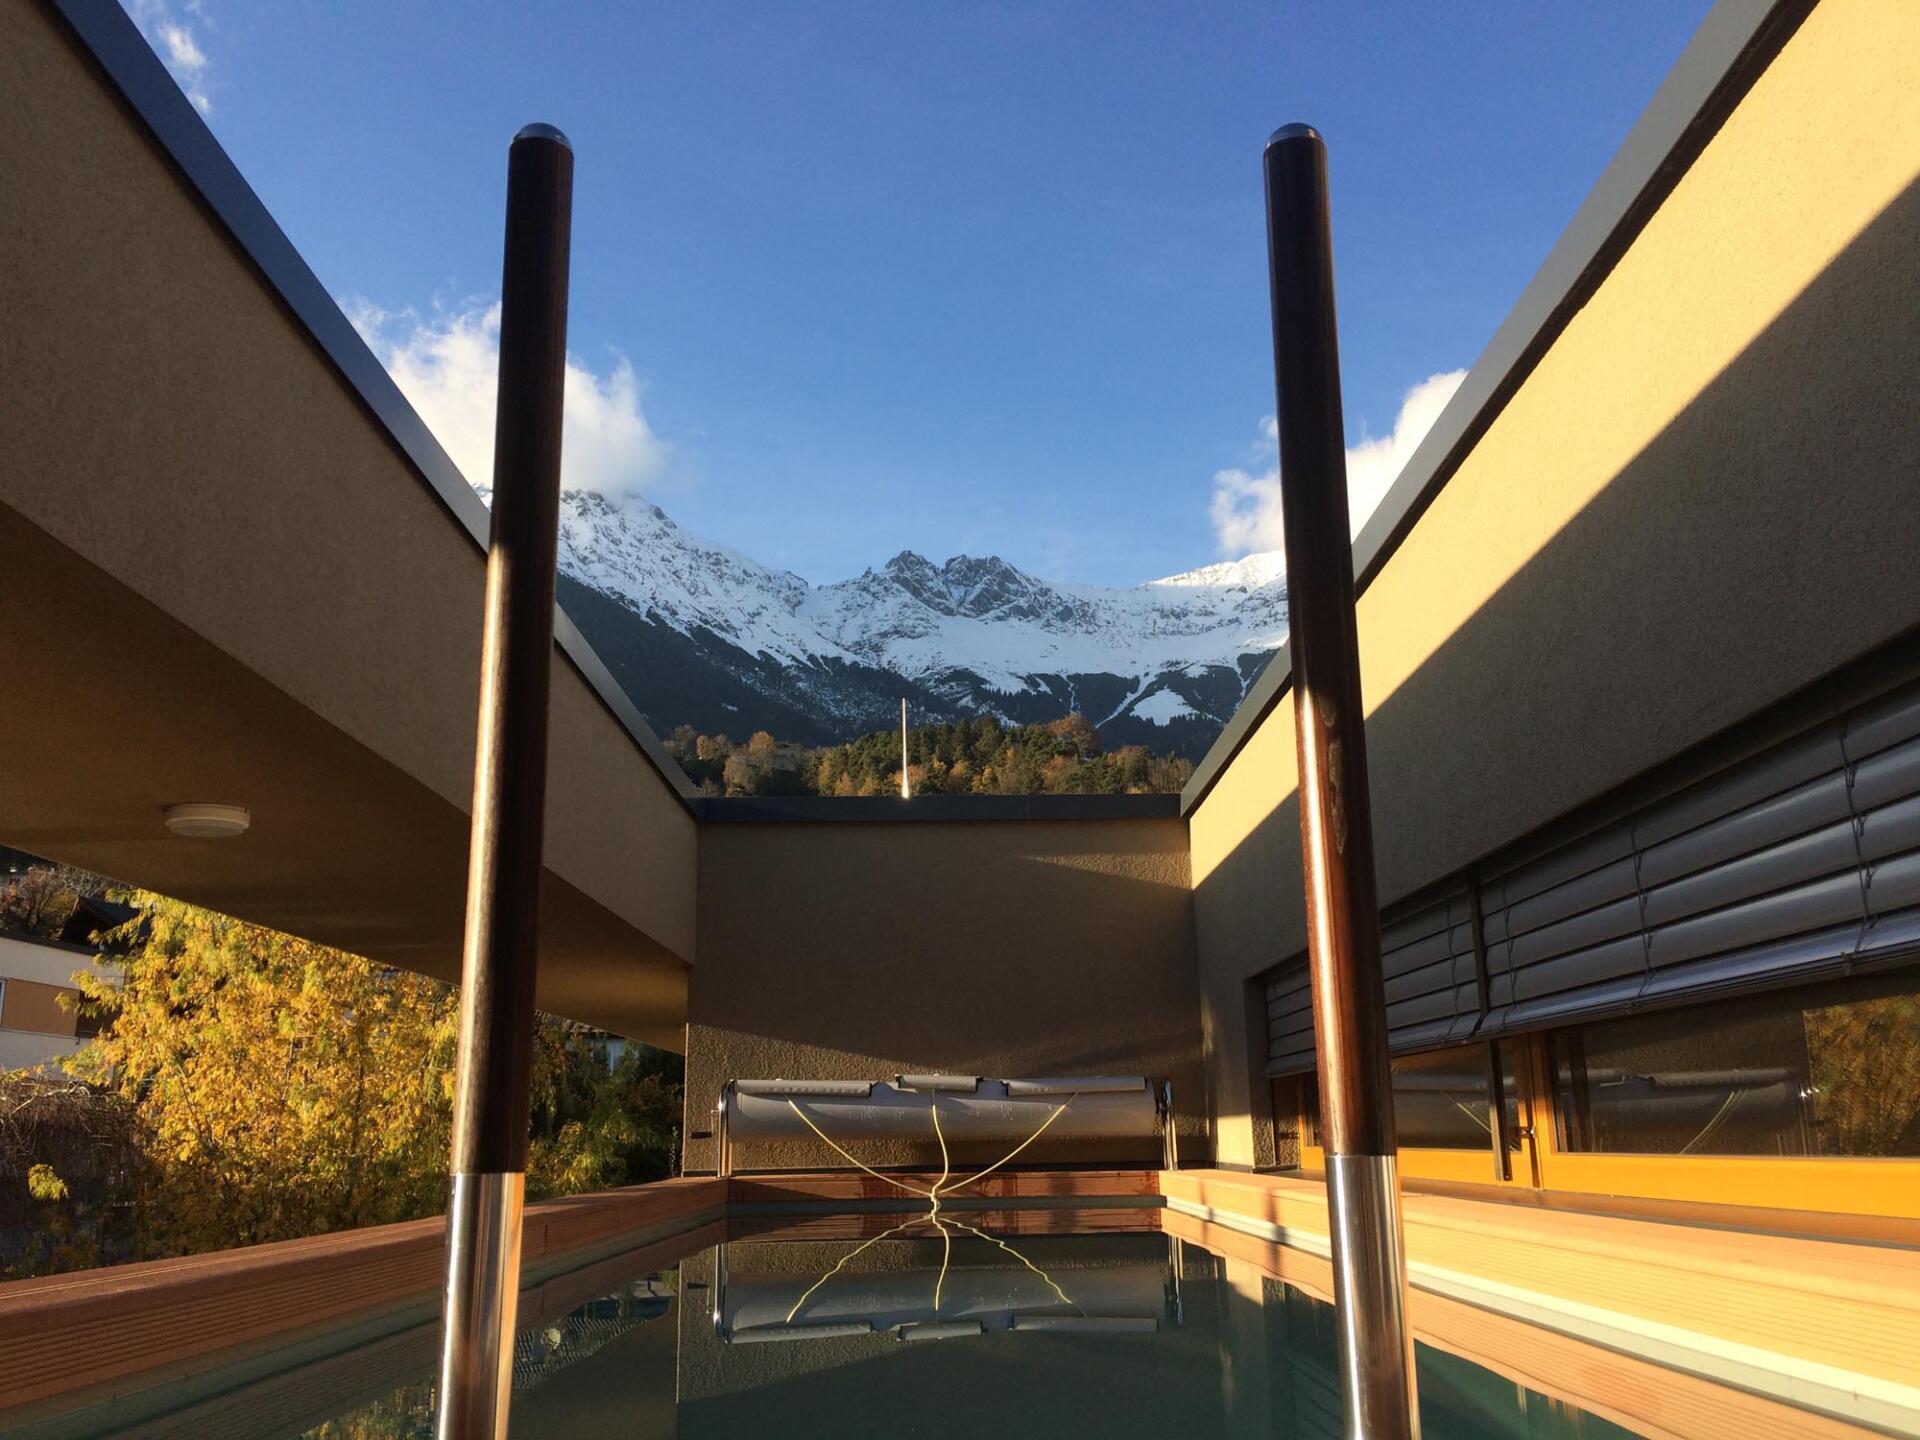 Folienpool - Schwimmbadbau Tirol - SST Saurwein Schwimmbad Technik